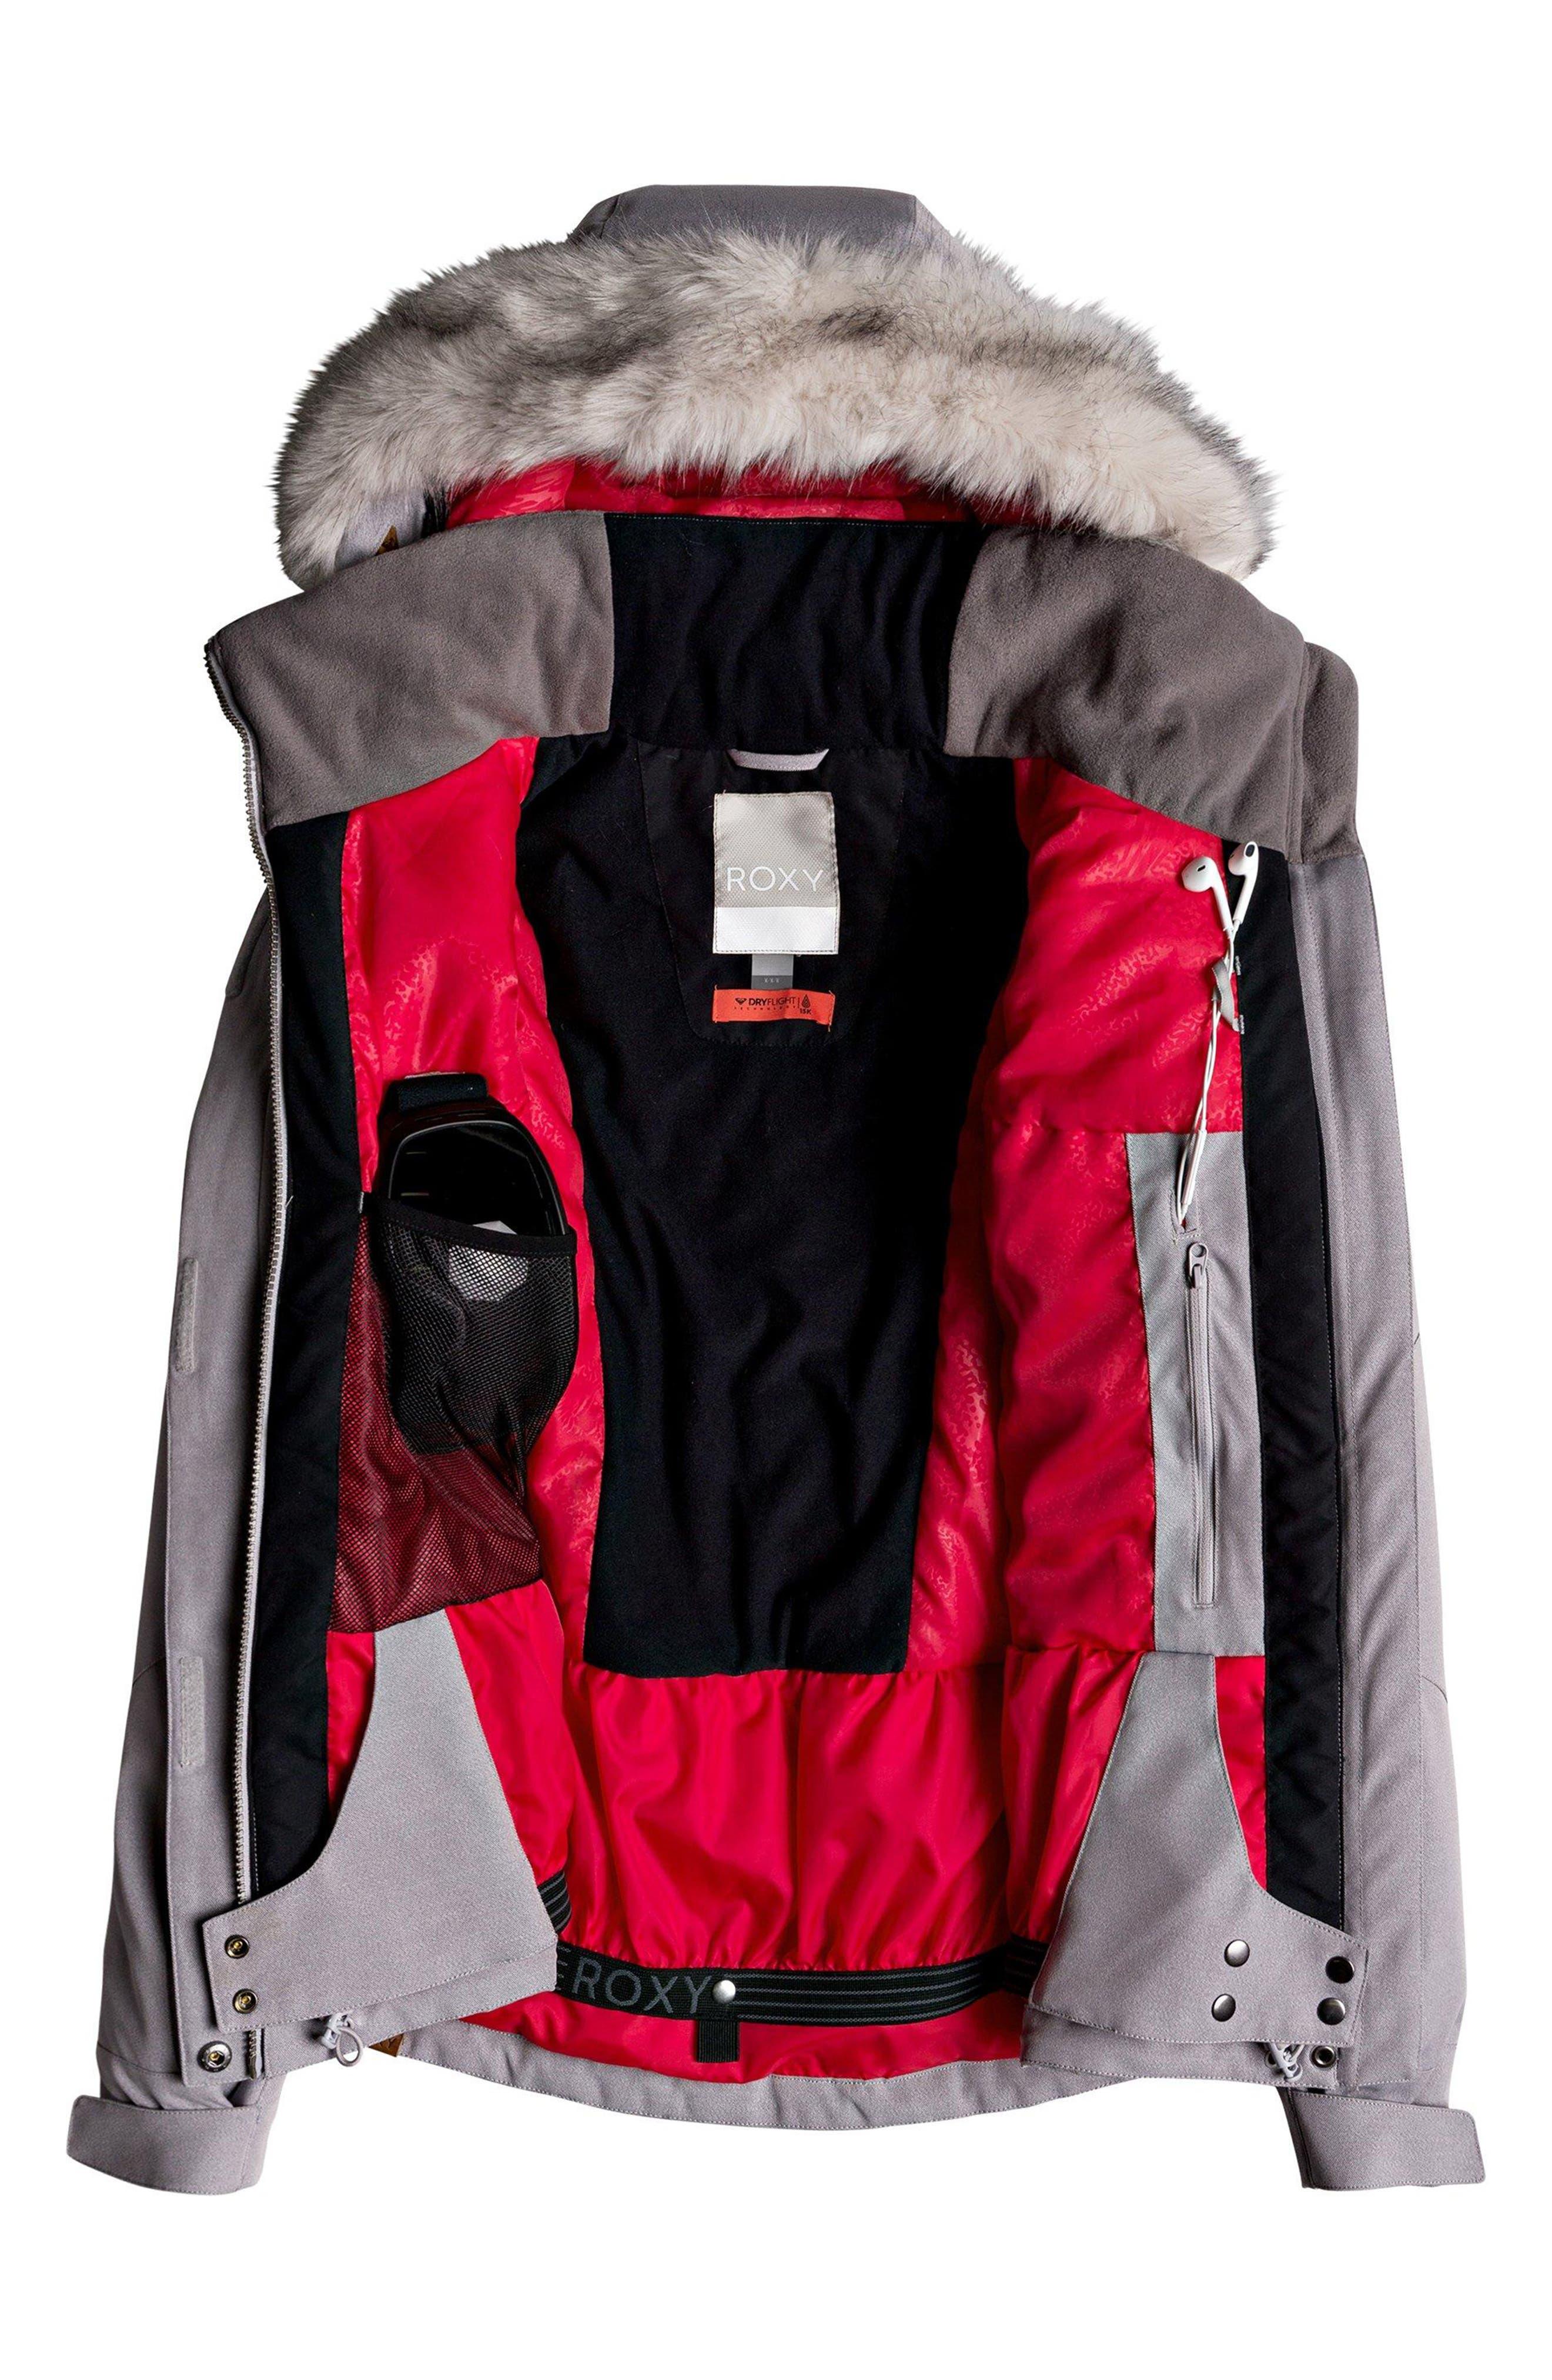 ROXY,                             Atmosphere Snow Jacket,                             Alternate thumbnail 2, color,                             020